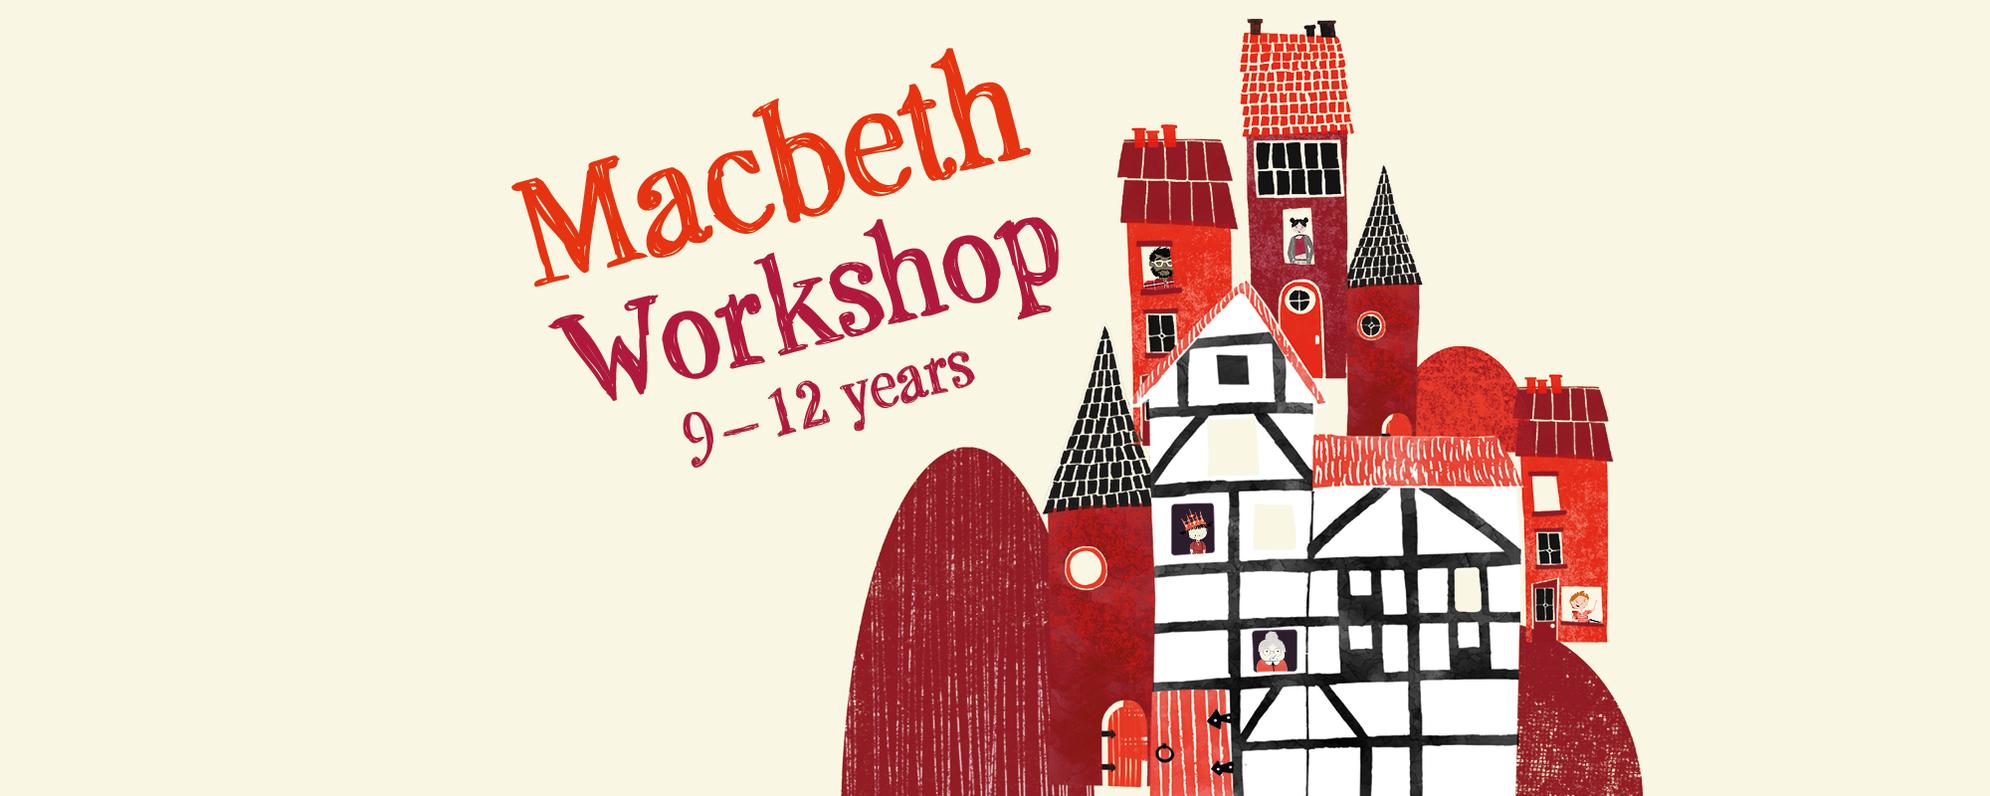 Title 'Macbeth Workshop 9-12 years' alongside cartoon houses and figures